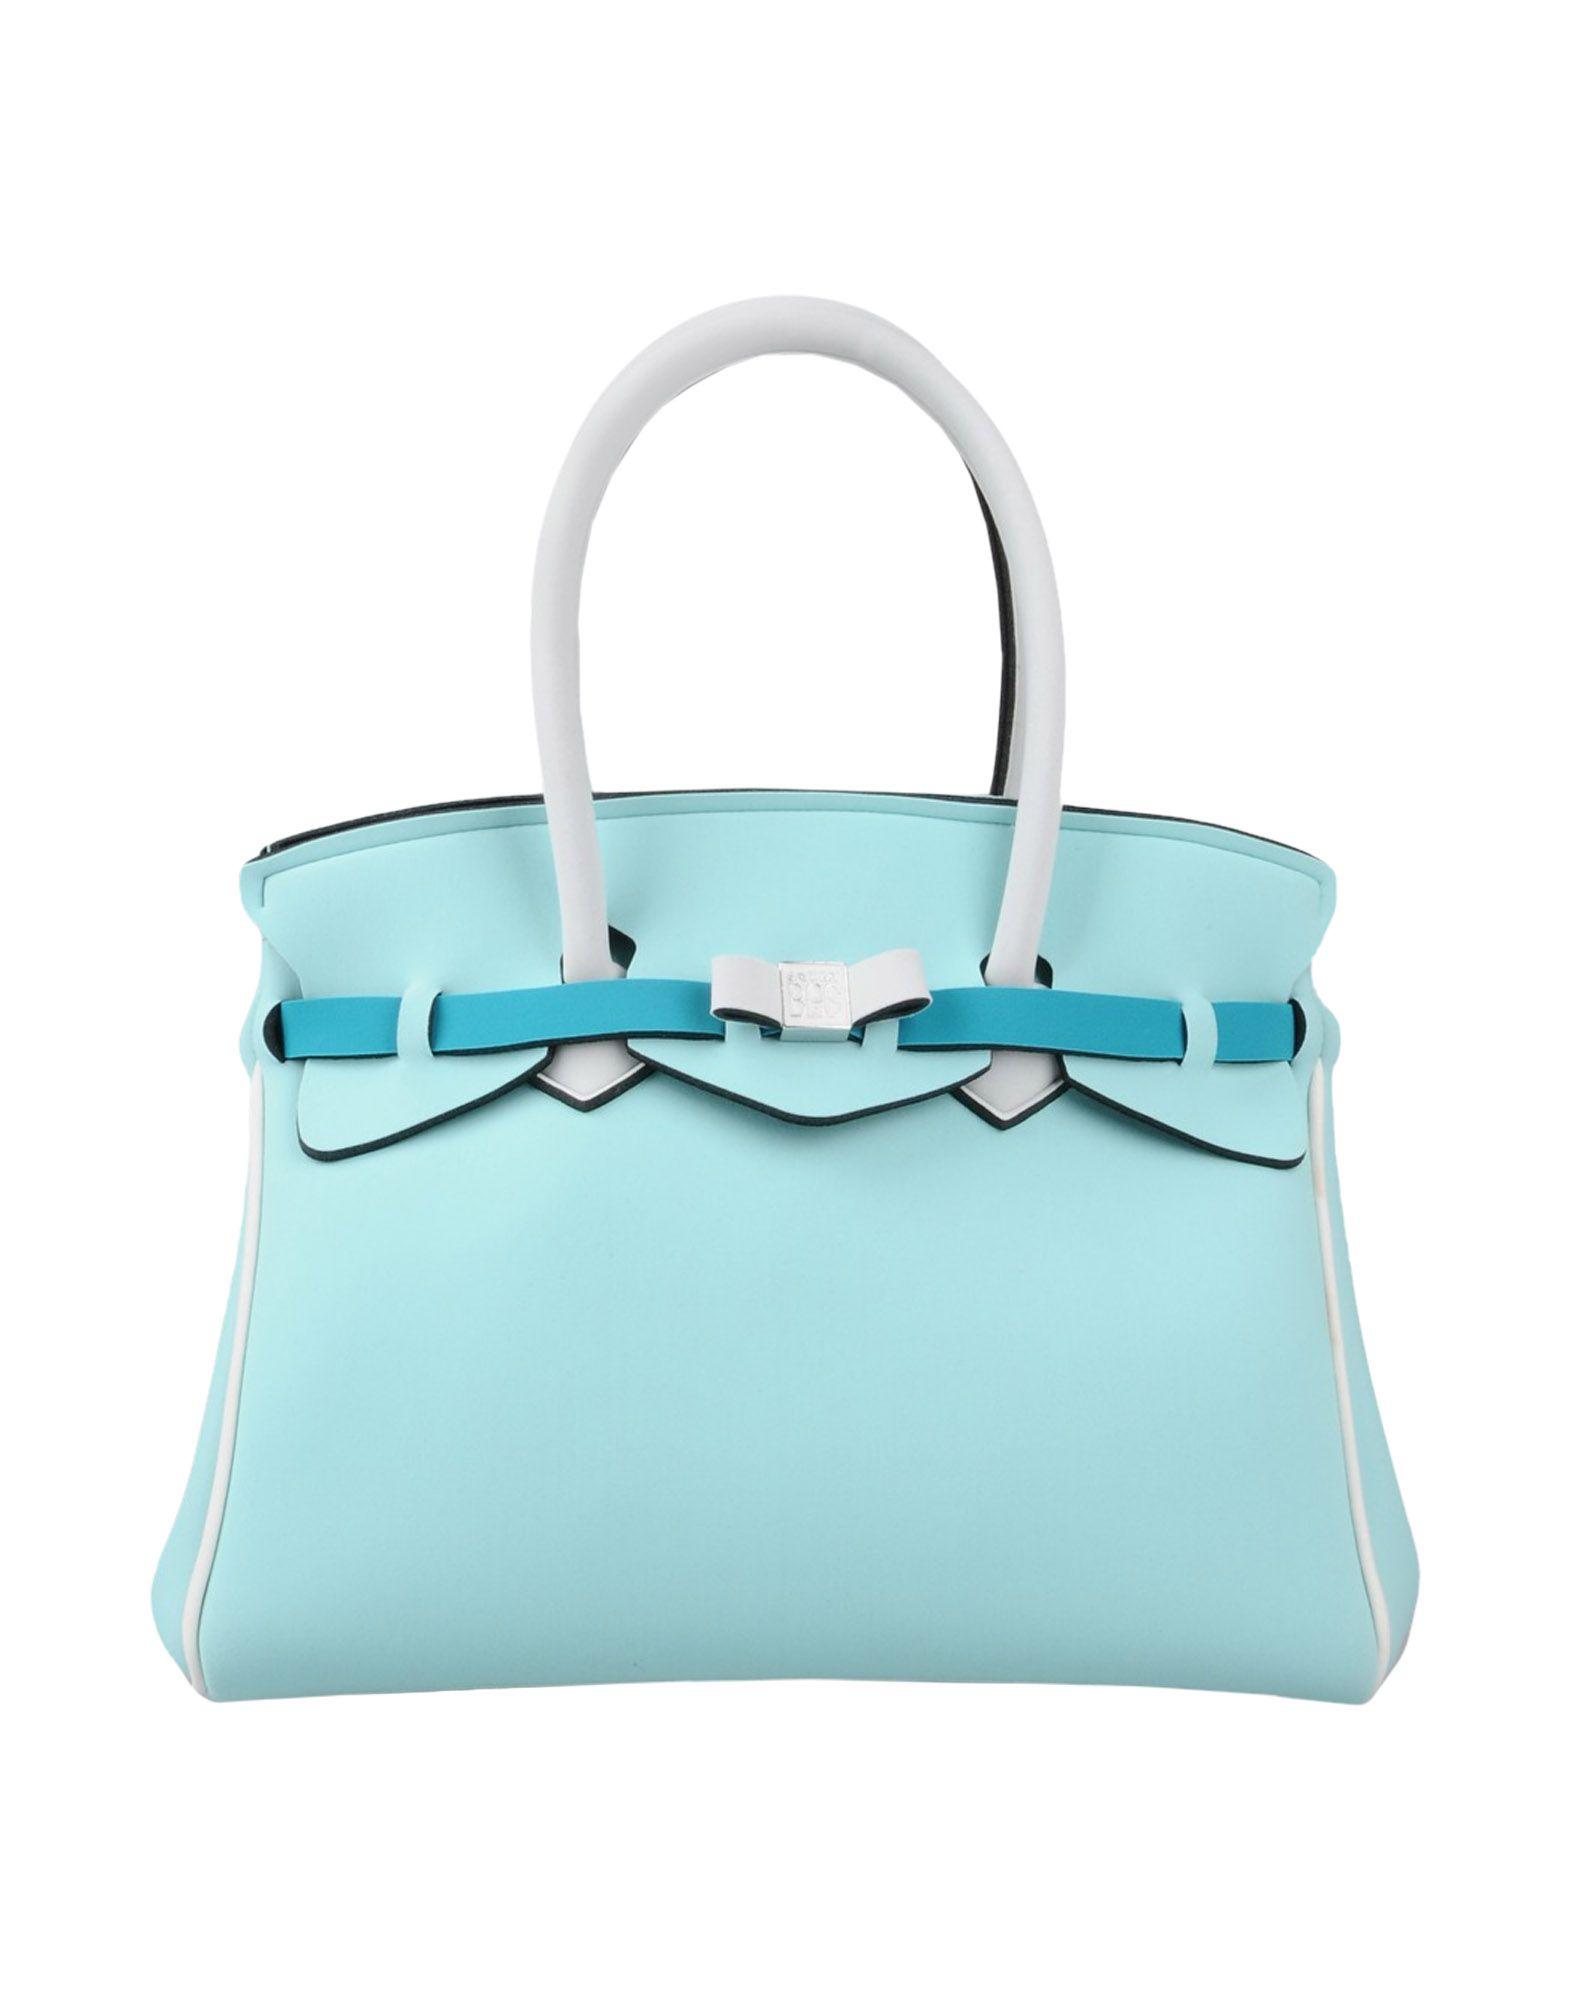 Фото - SAVE MY BAG Сумка на руку 2017 luxury brand women handbag oil wax leather vintage casual tote large capacity shoulder bag big ladies messenger bag bolsa